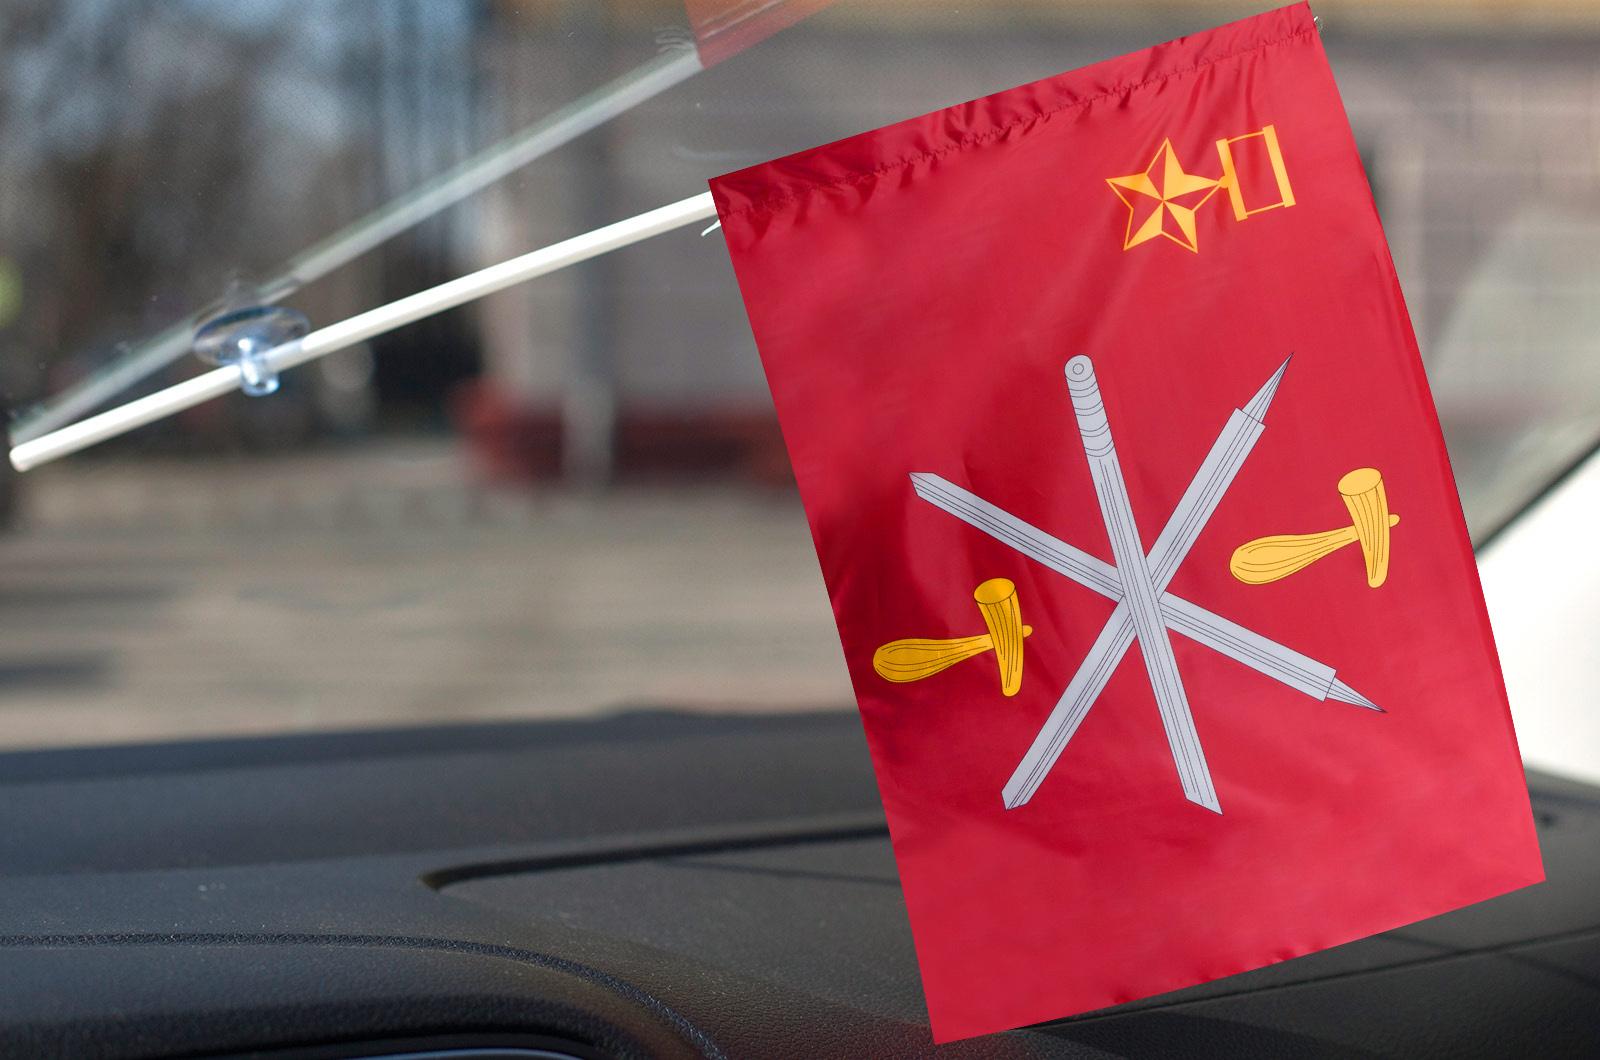 Флажок Тулы в машину